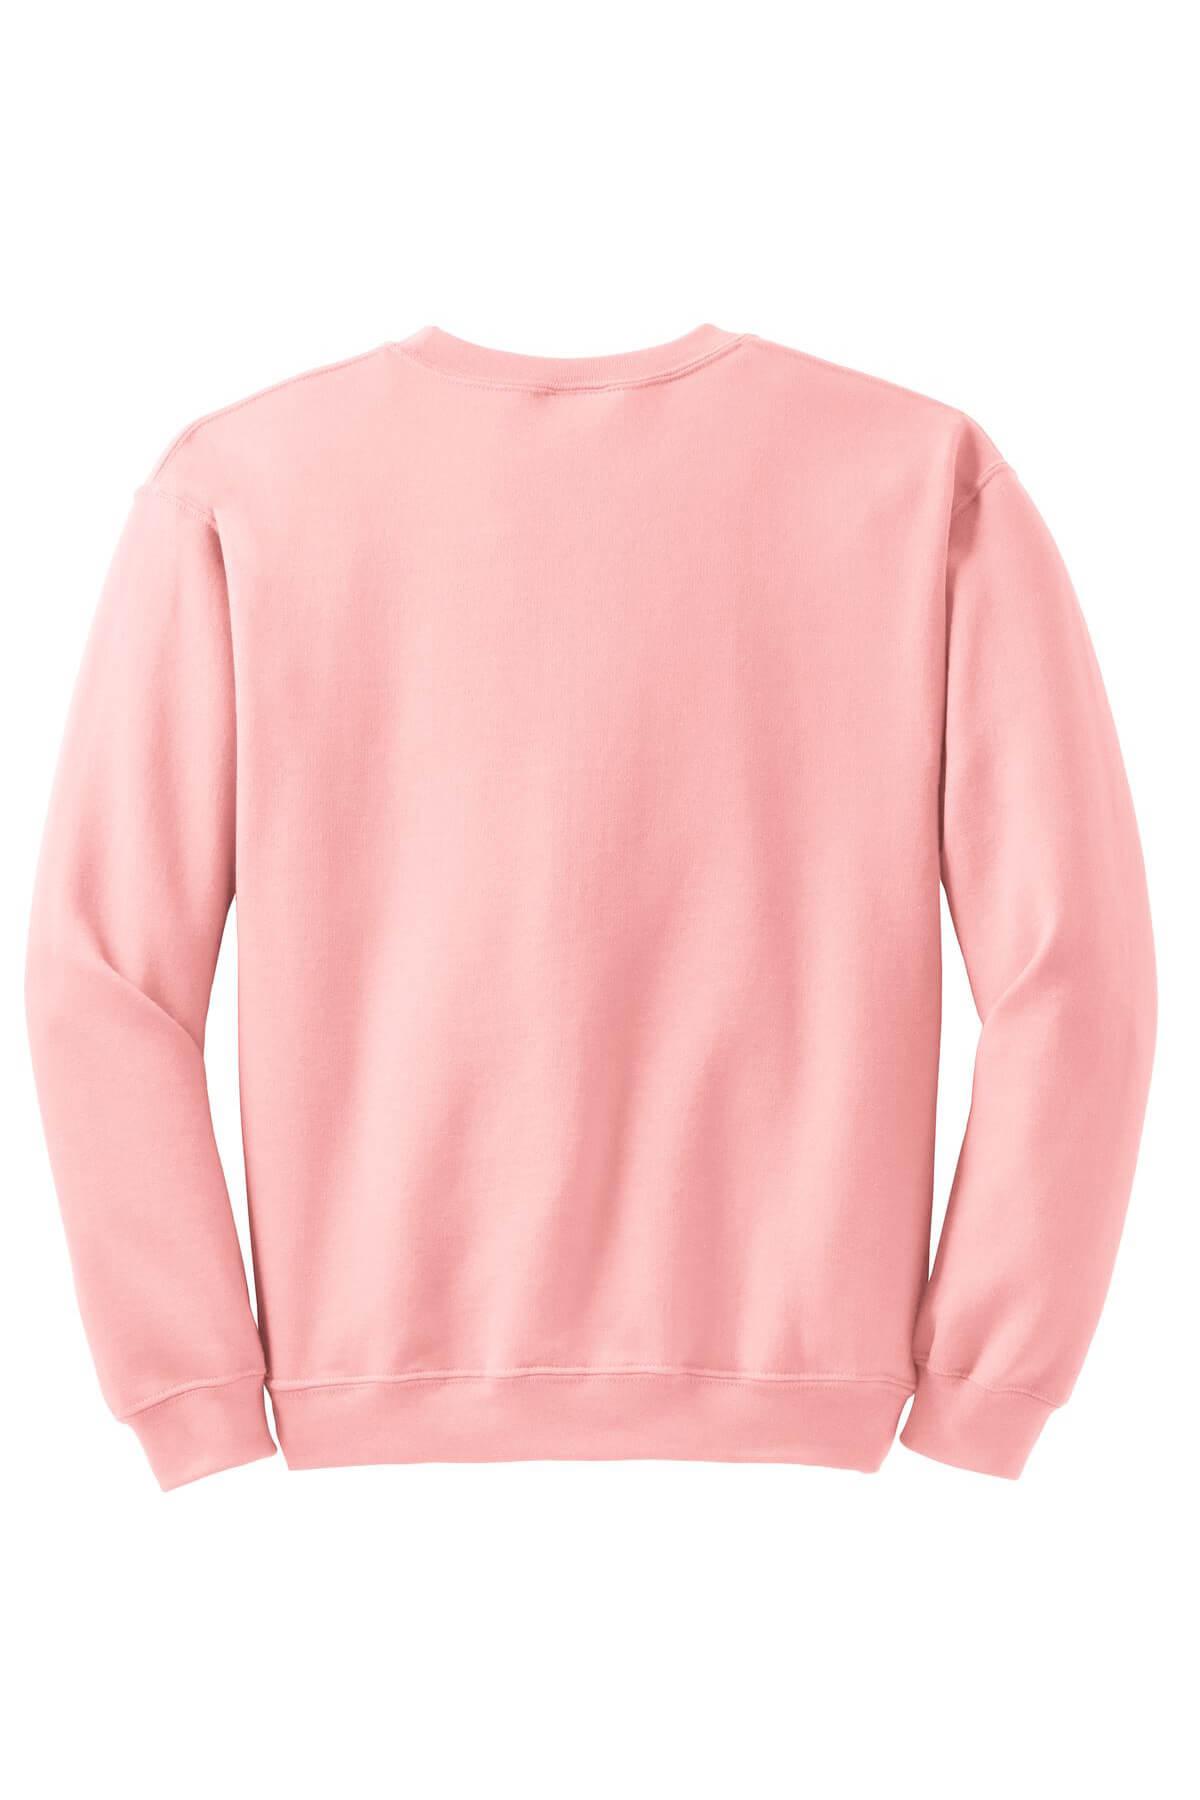 18000-light-pink-6